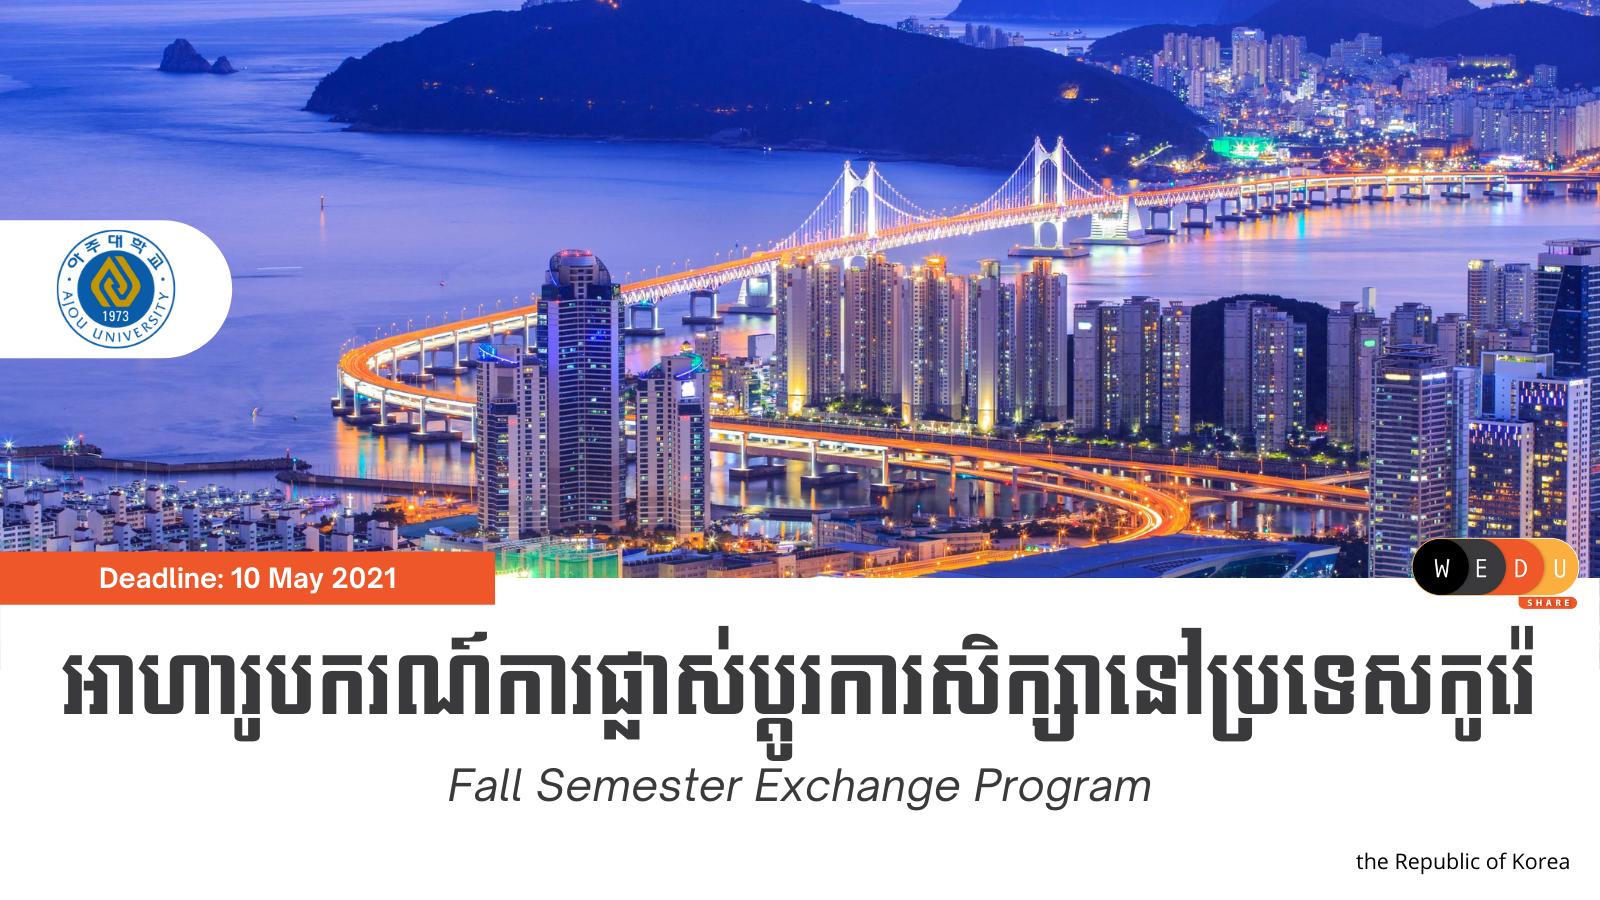 Fall Semester Exchange Program